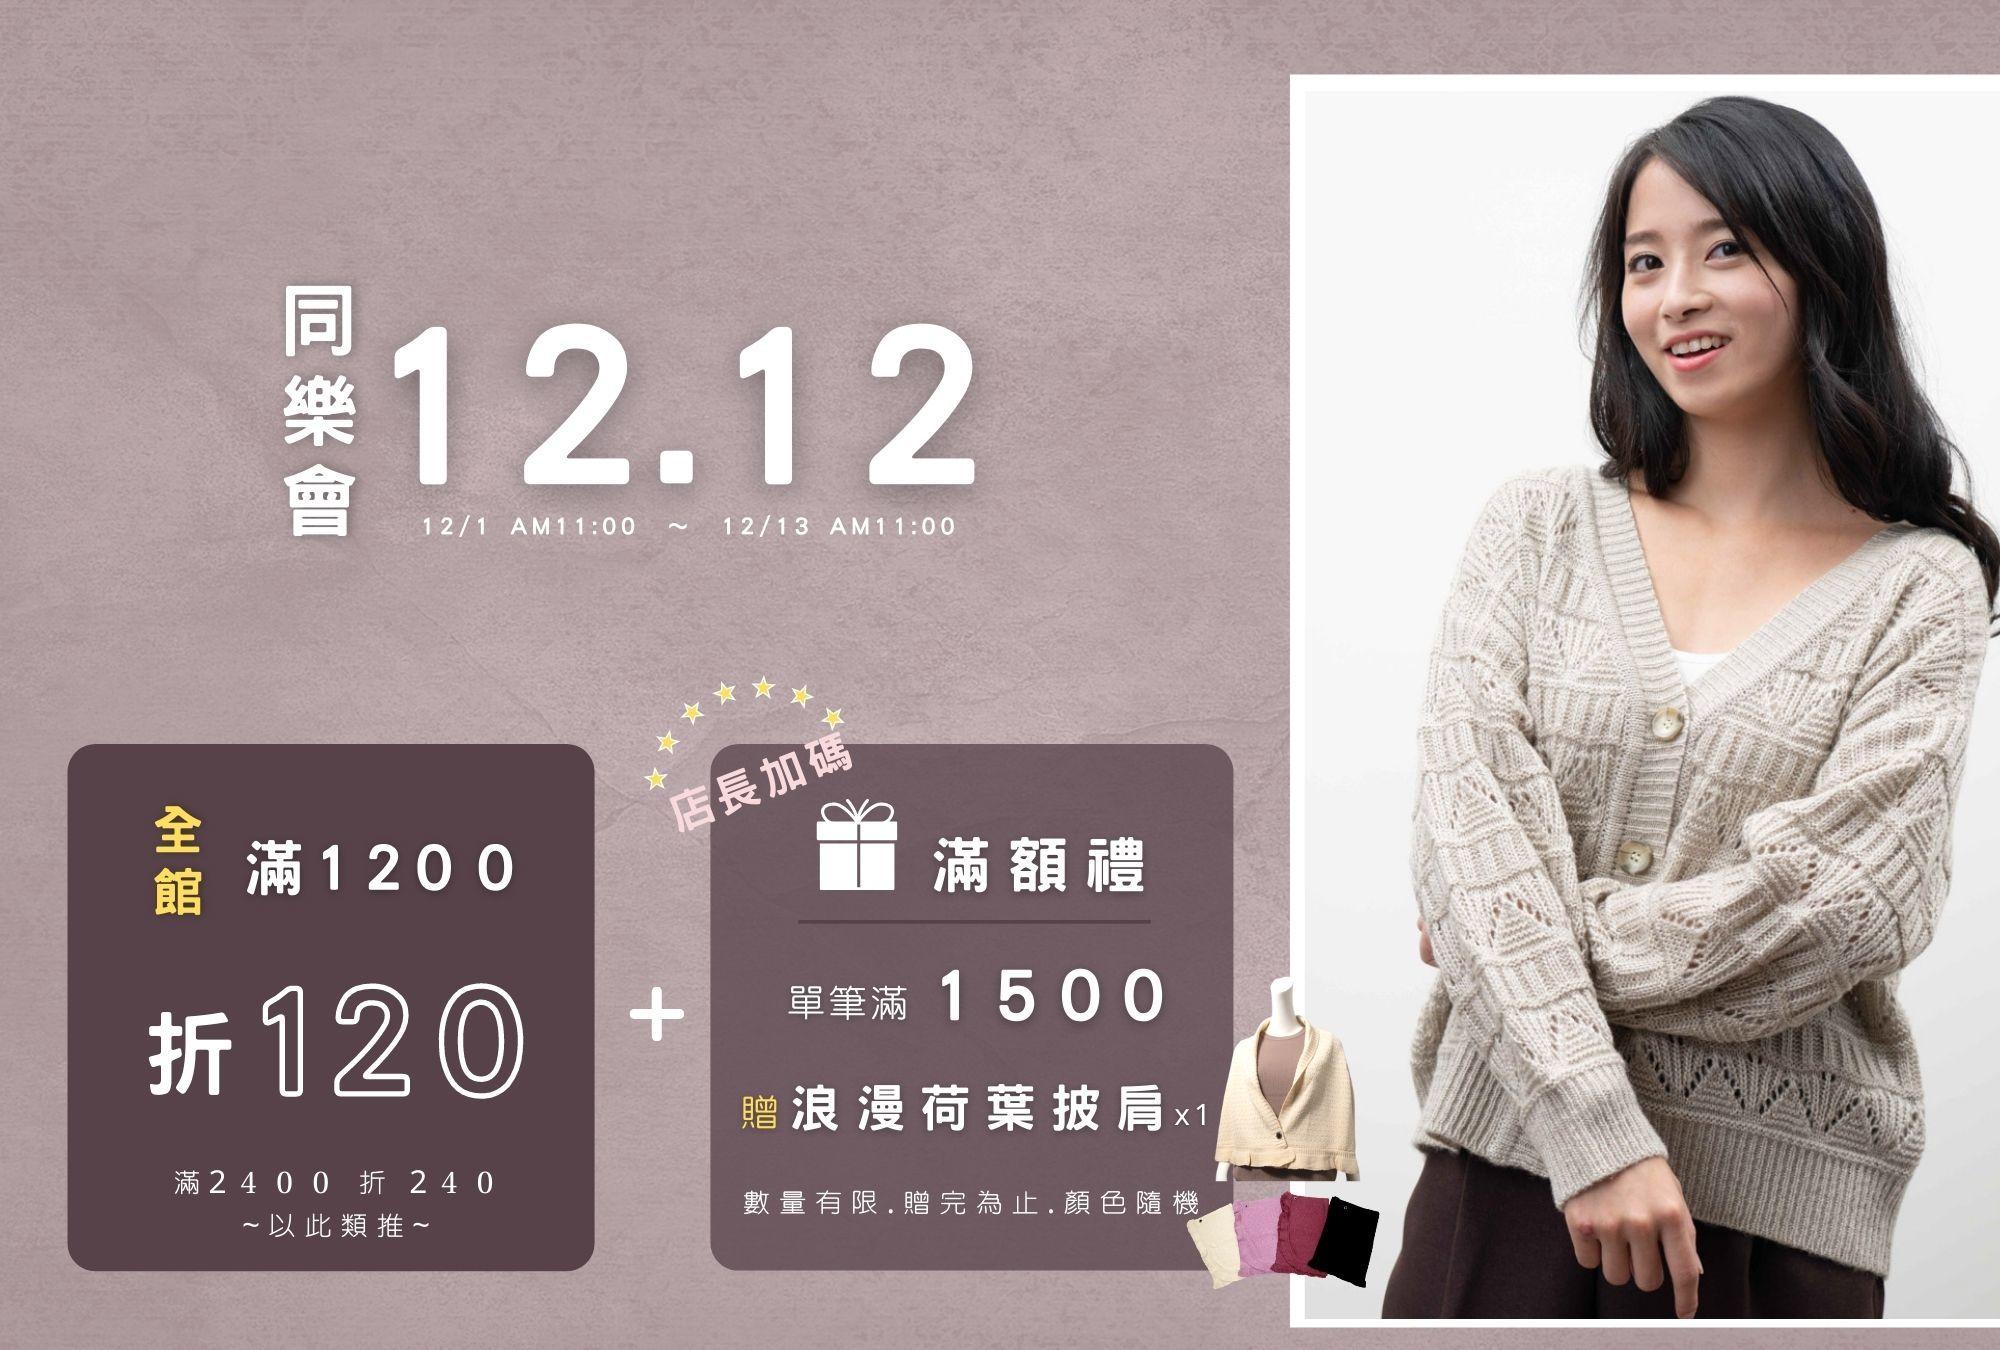 1212活動 | O-LIWAY 台灣製針織衫